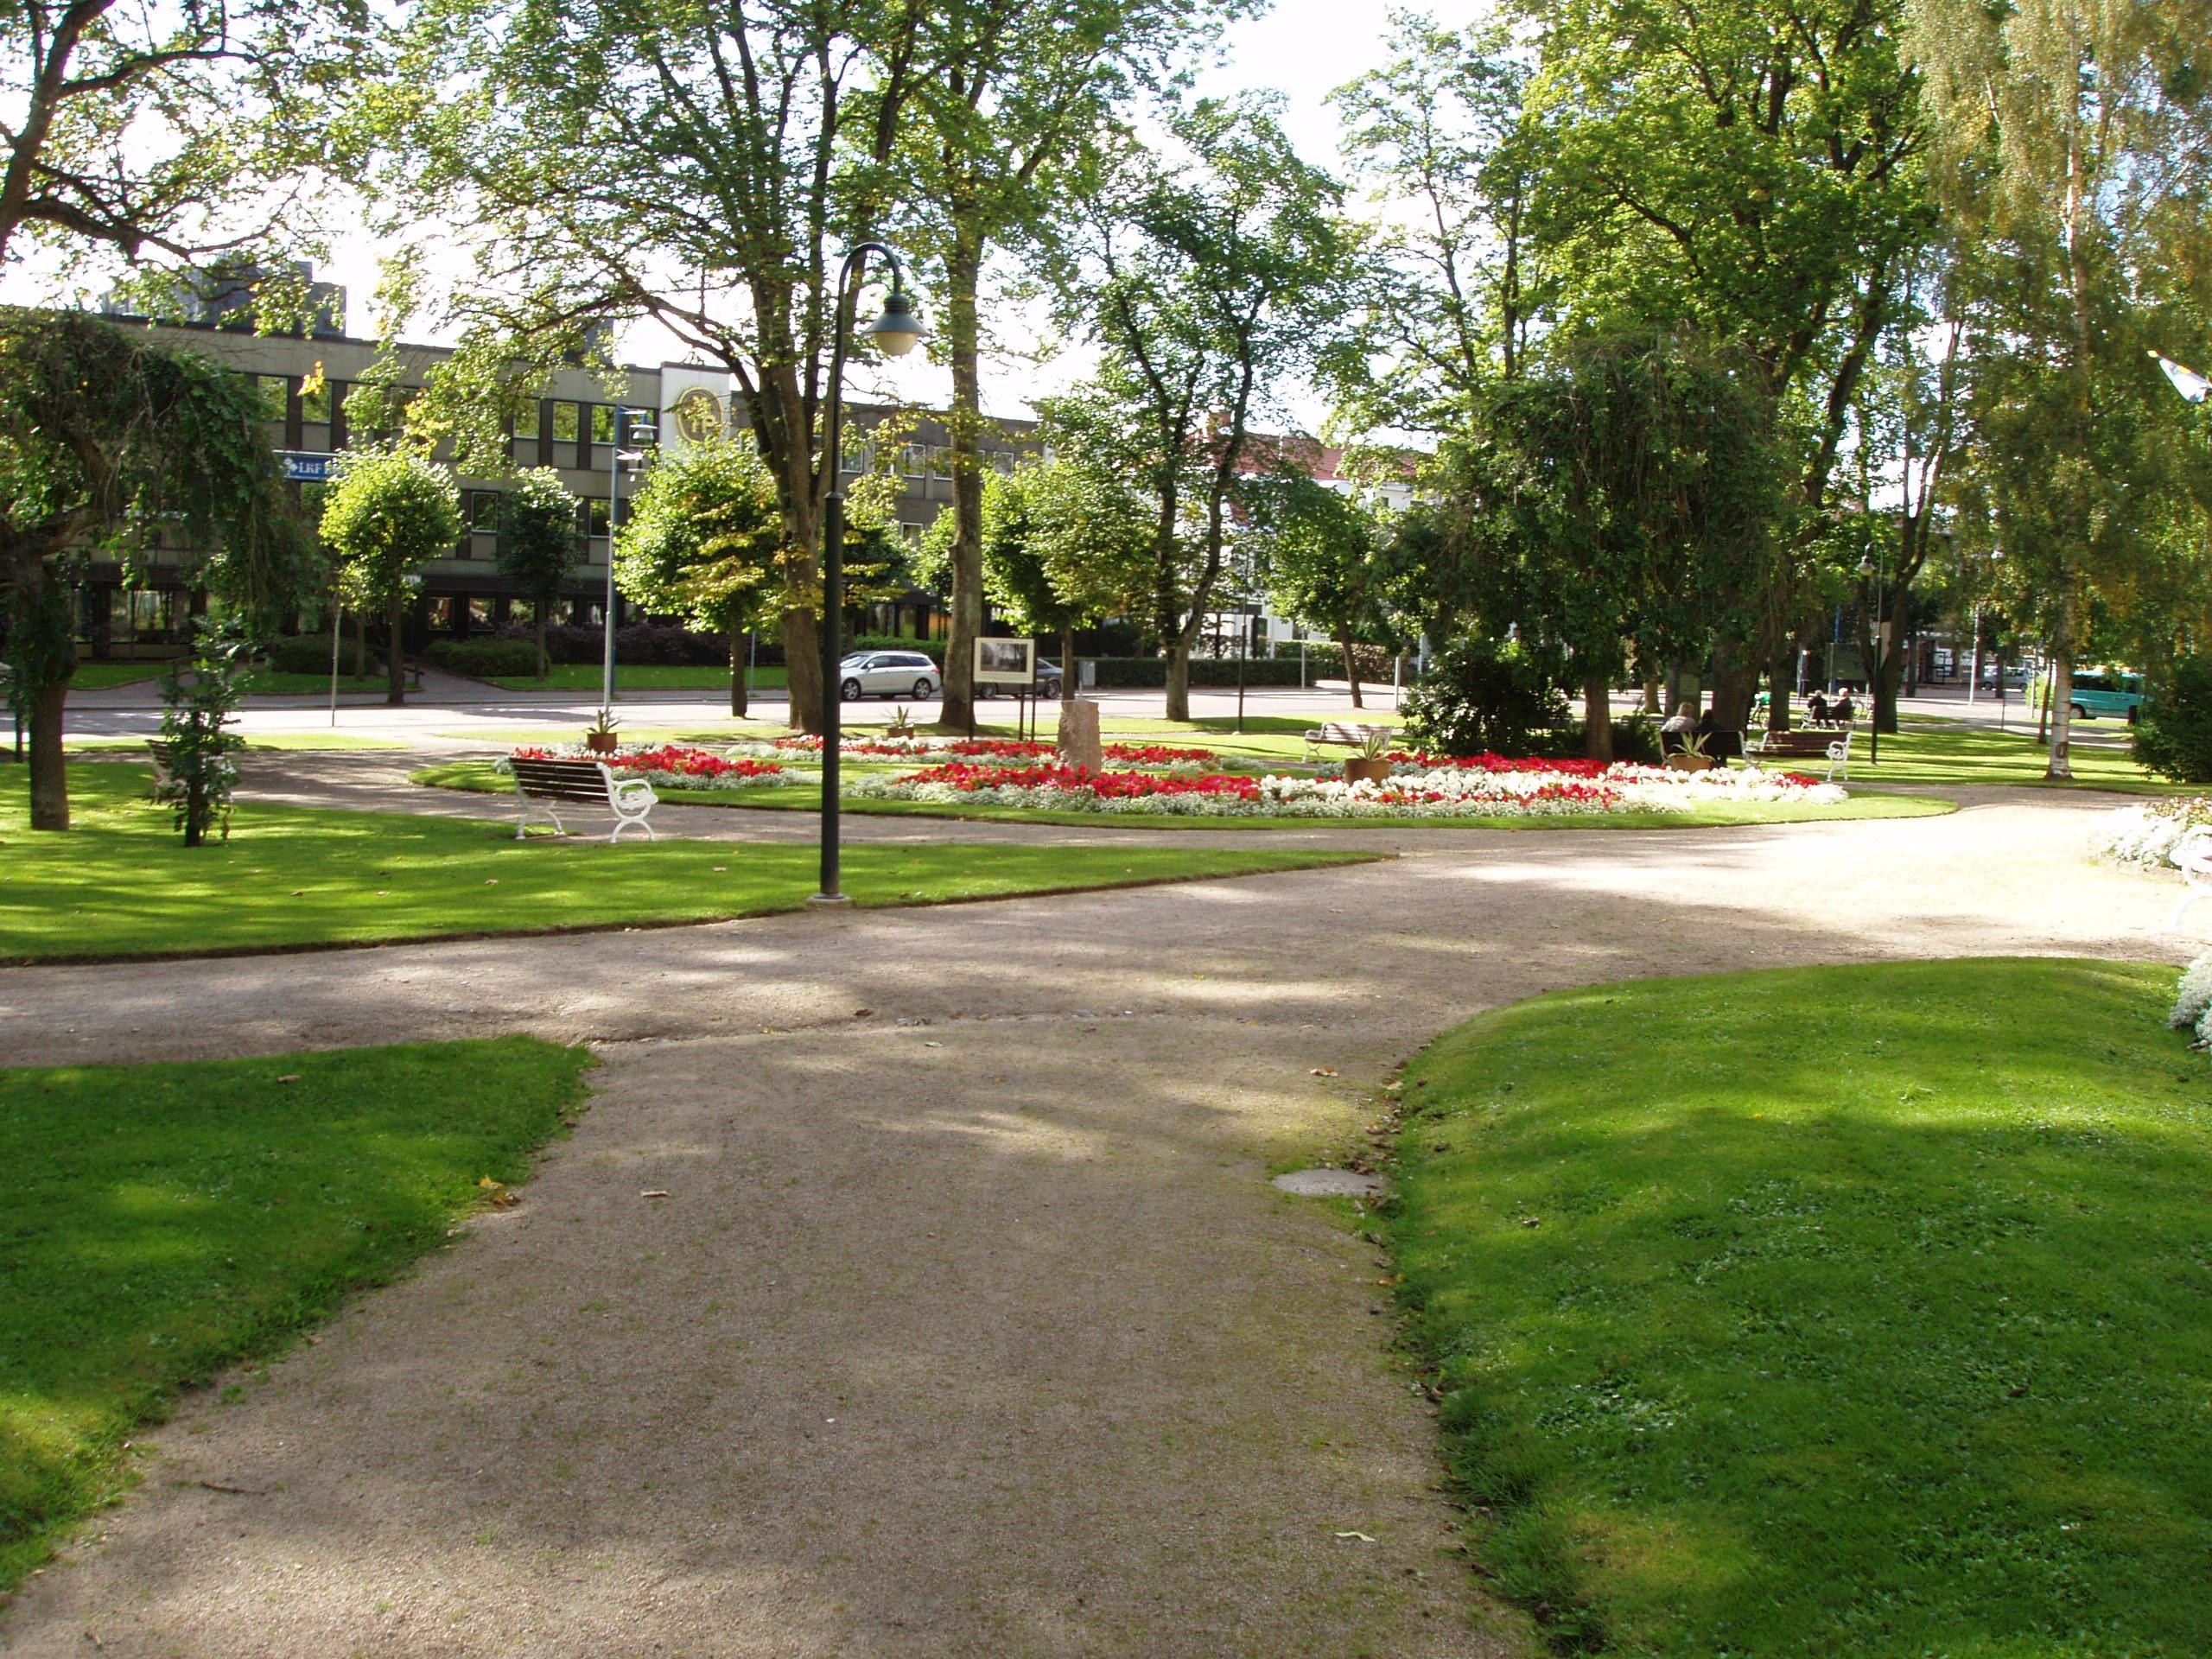 © Apoteksparken, Apoteksparken, Vetlanda